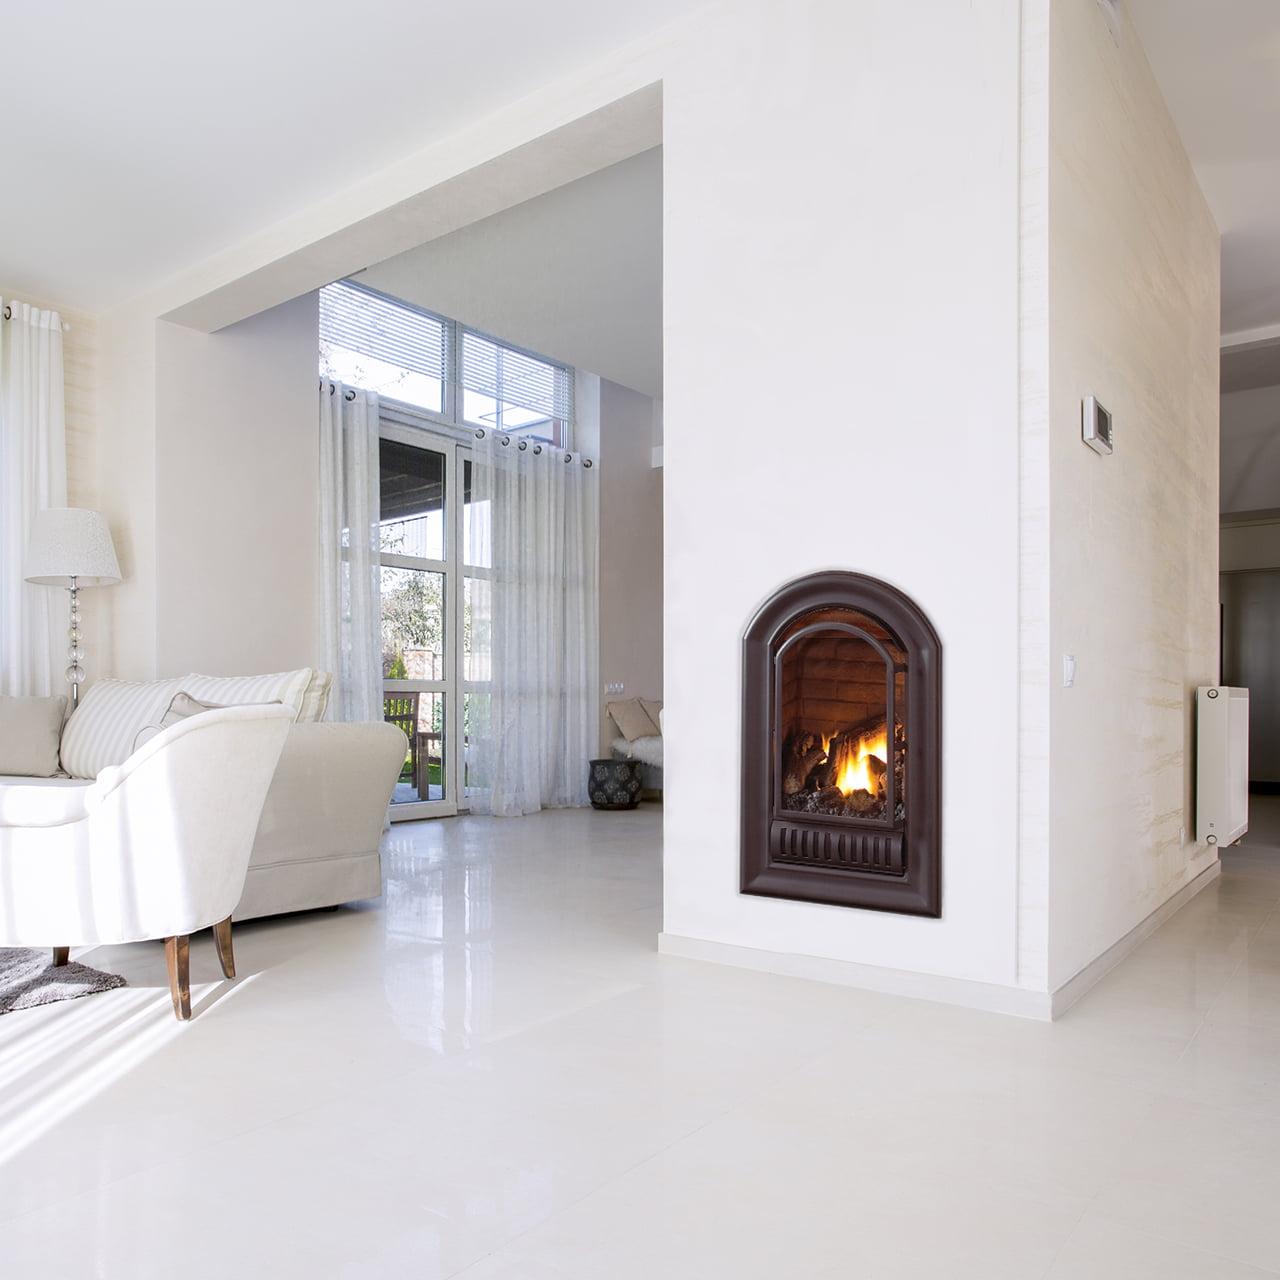 HearthSense A-Series Liquid Propane Vent Free Fireplace Insert 20,000 BTU by Vent-Free Fireplaces